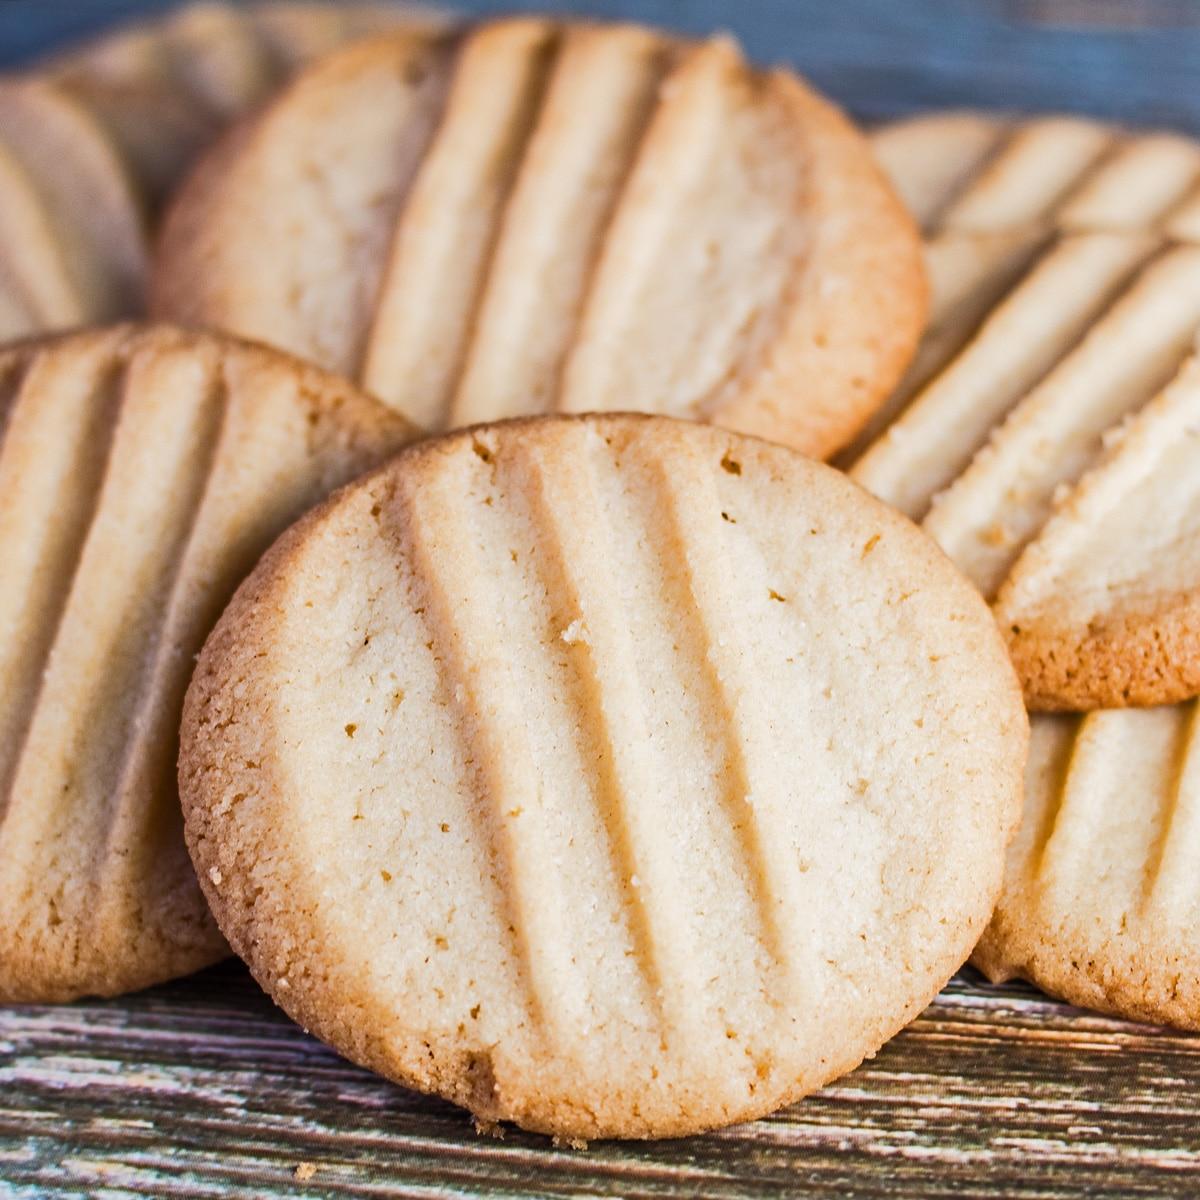 Fork biscuits baked until golden and randomly piled onto wooden grain background.